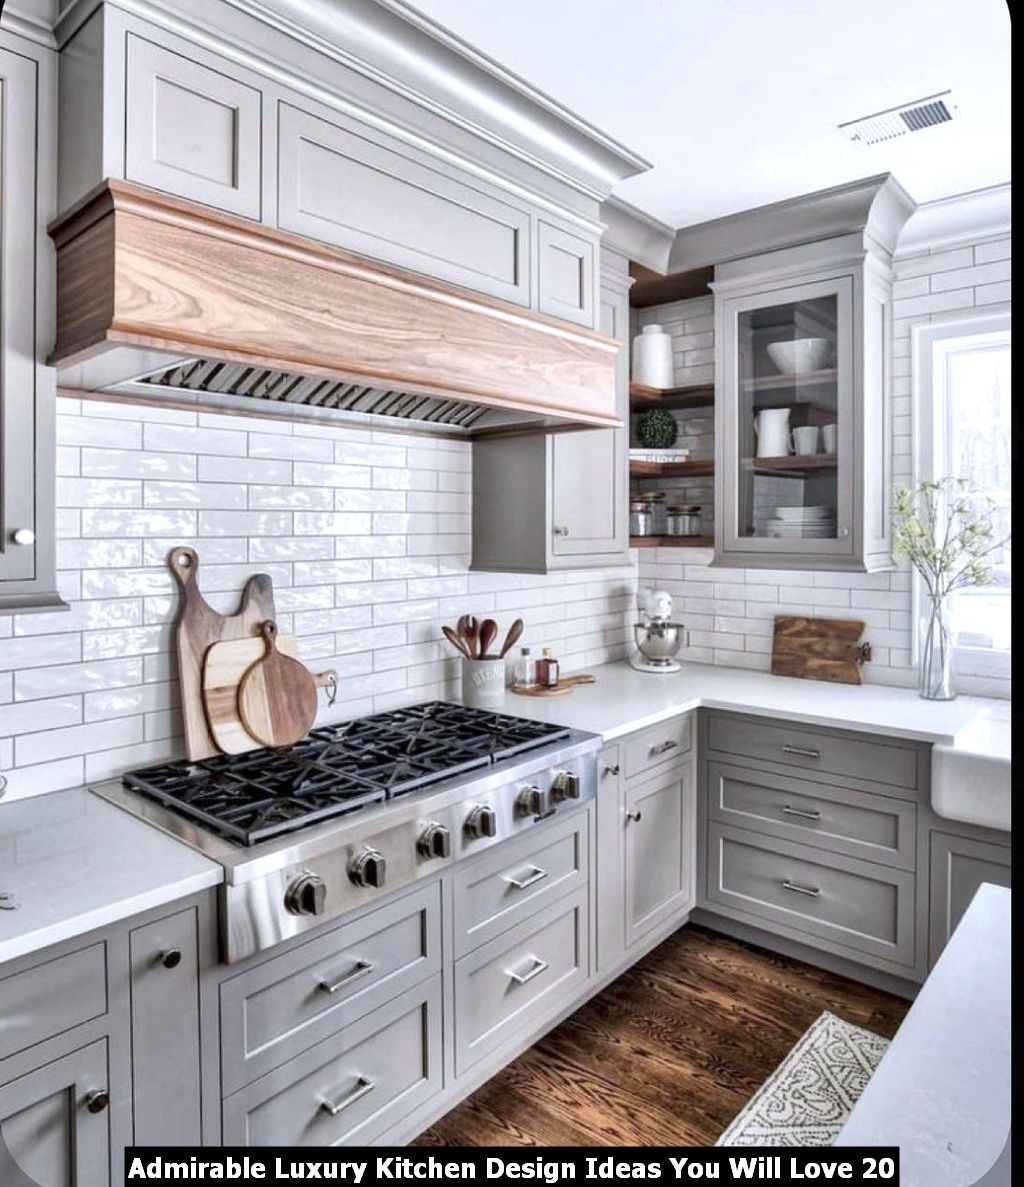 Admirable Luxury Kitchen Design Ideas You Will Love 20